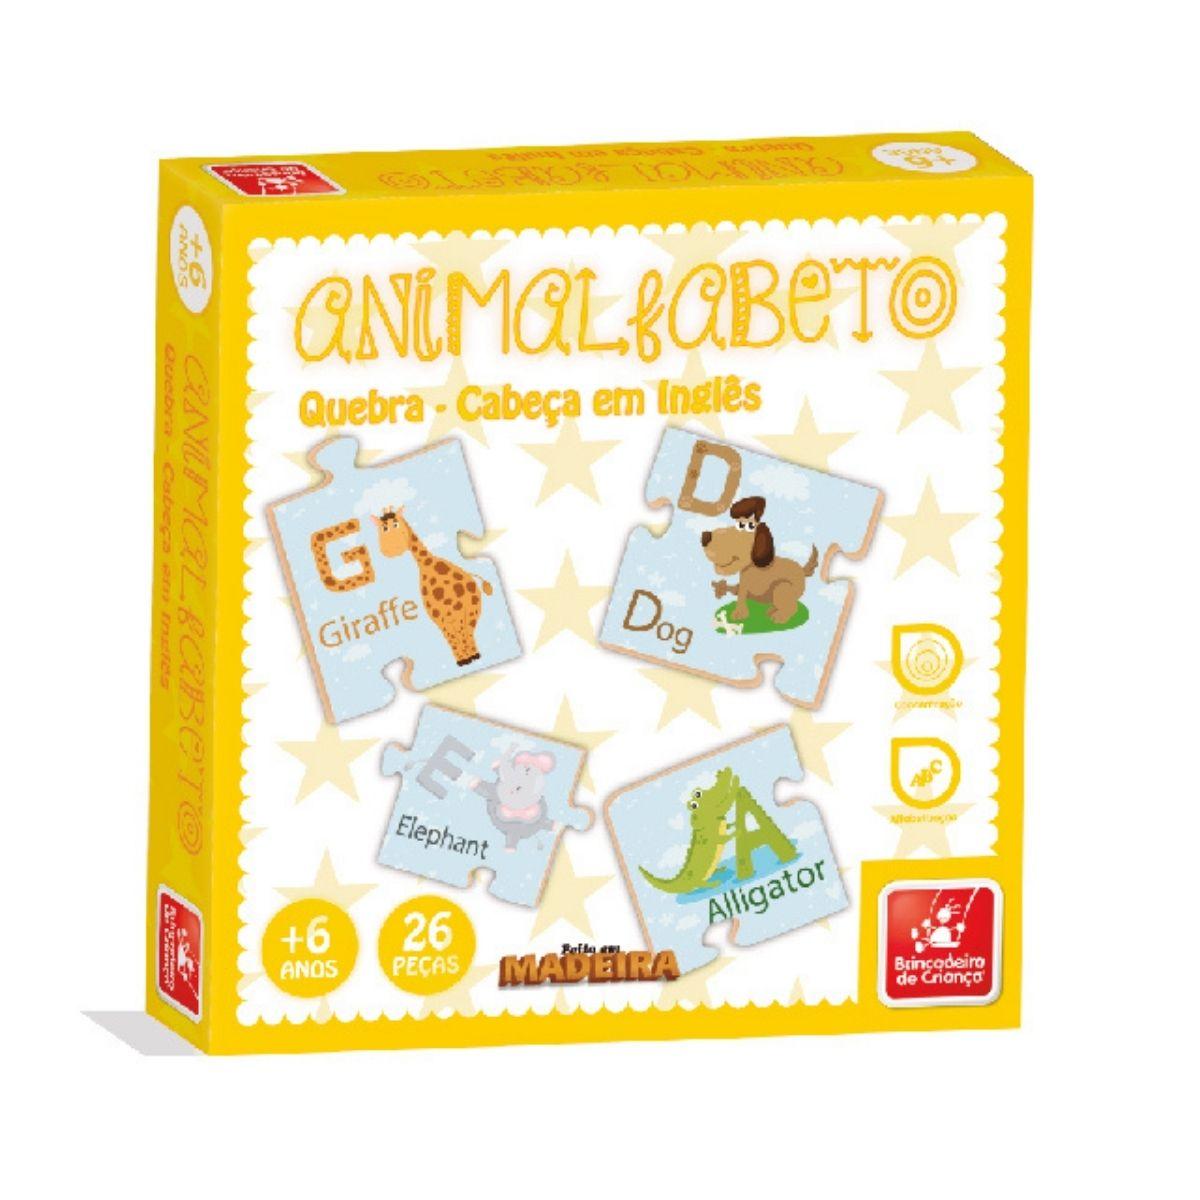 Jogo Animalfabeto Em Inglês Bilíngue Infantil